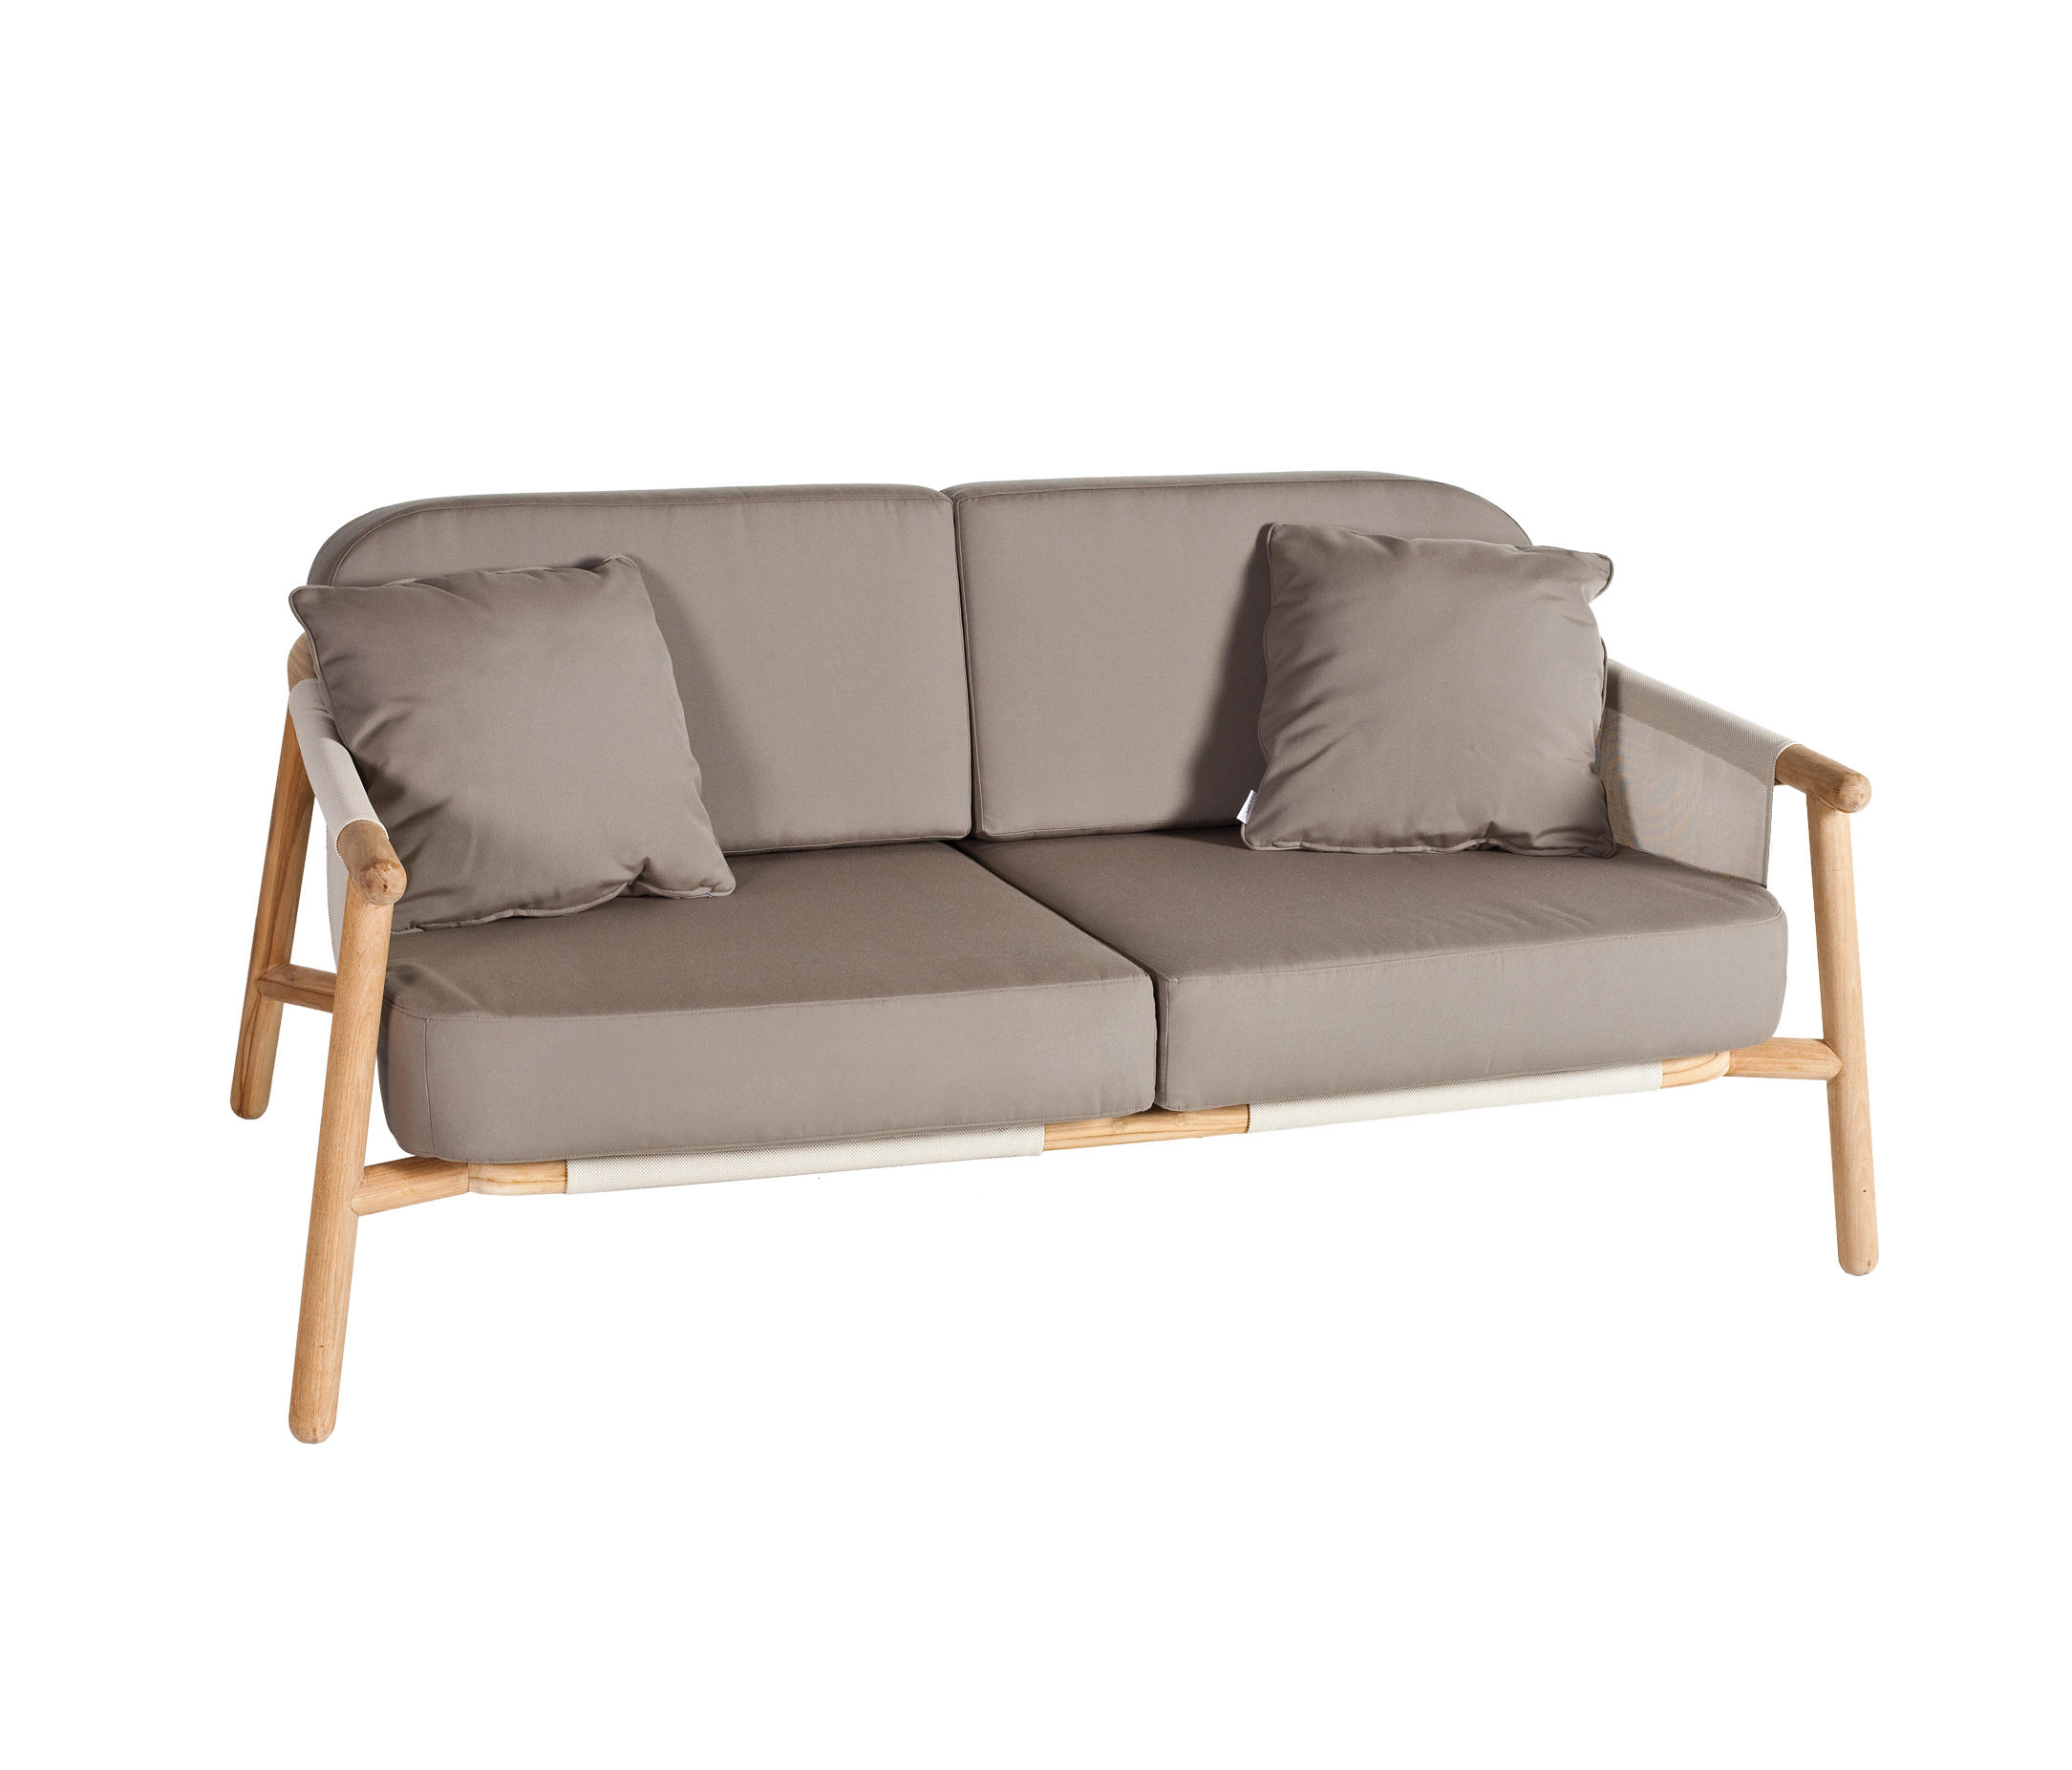 Hamp sofa 2 sofas de jardin de point architonic for Sofas para jardin